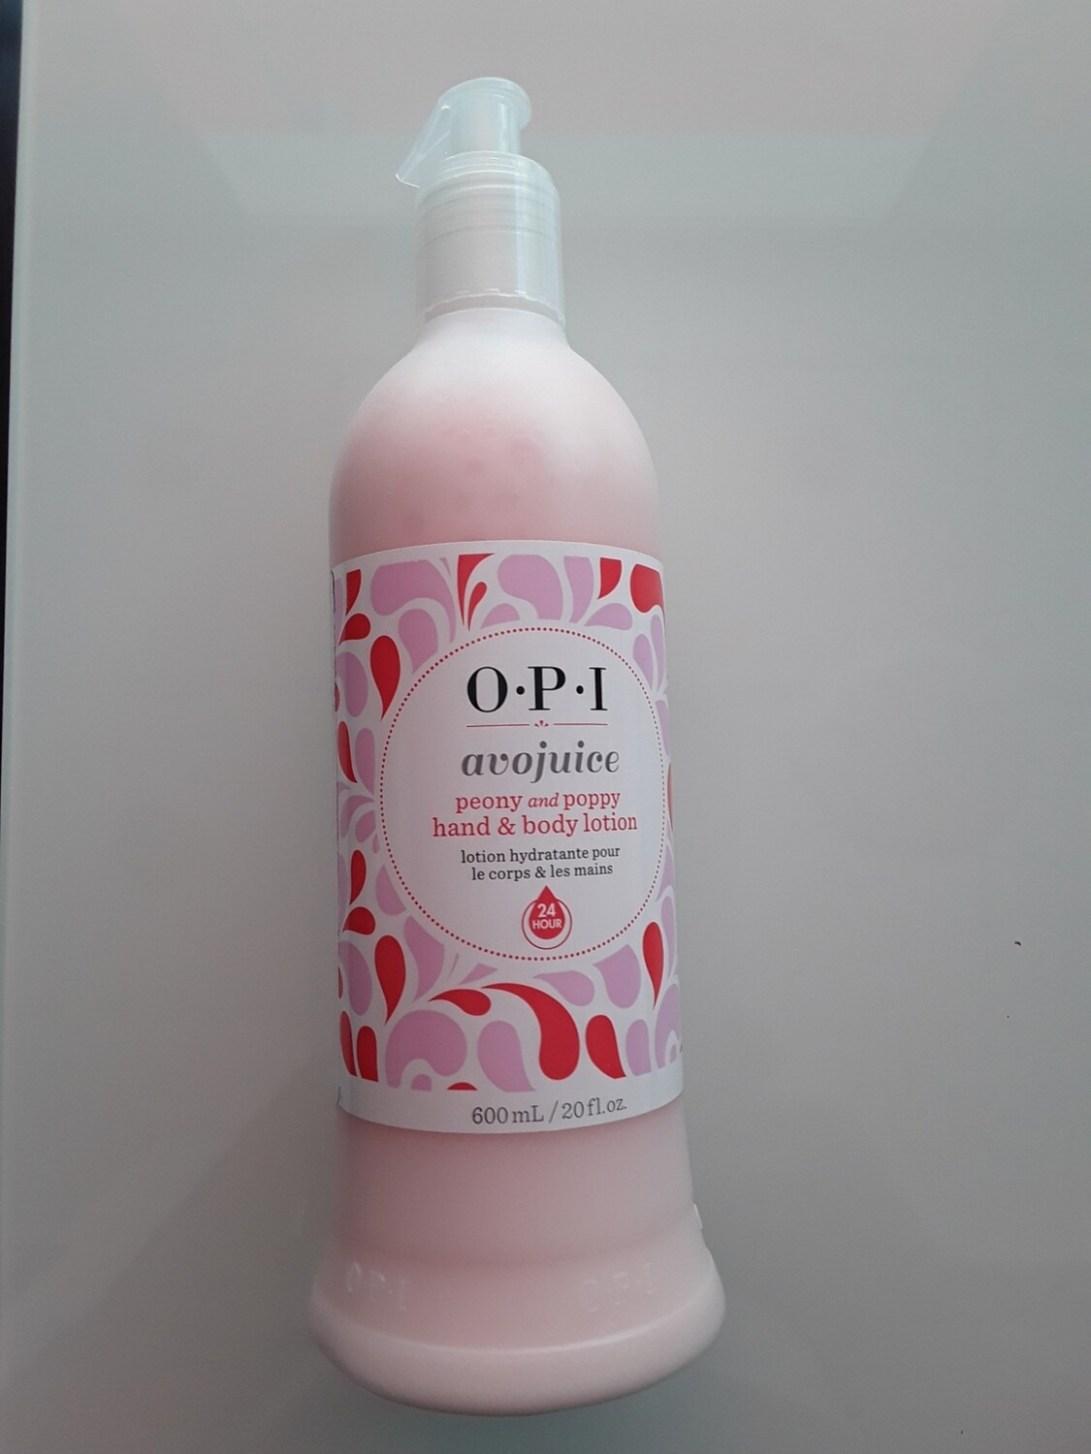 Crème mains et corps Avojuice peony and poppy 600ml